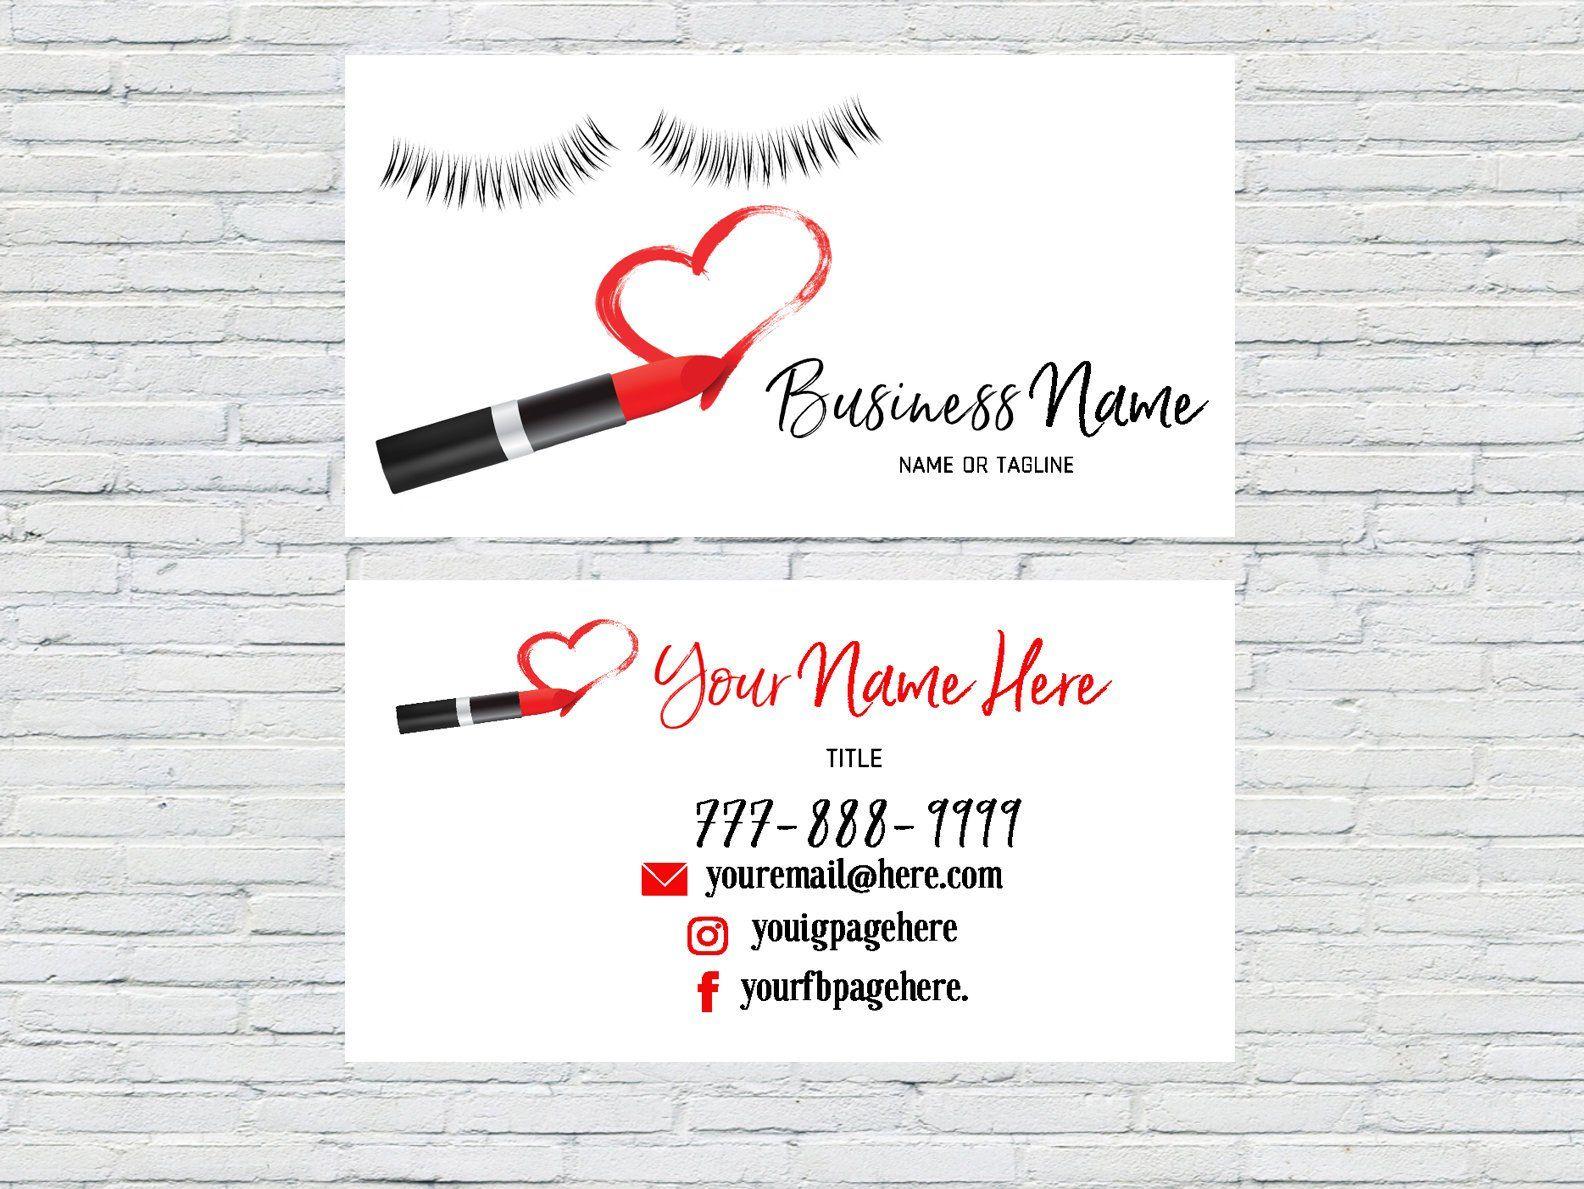 Red Makeup Artist Business Card Lash Extensions Make Up Artist Esthetician 3d Las Makeup Artist Business Cards Makeup Artist Business Artist Business Cards